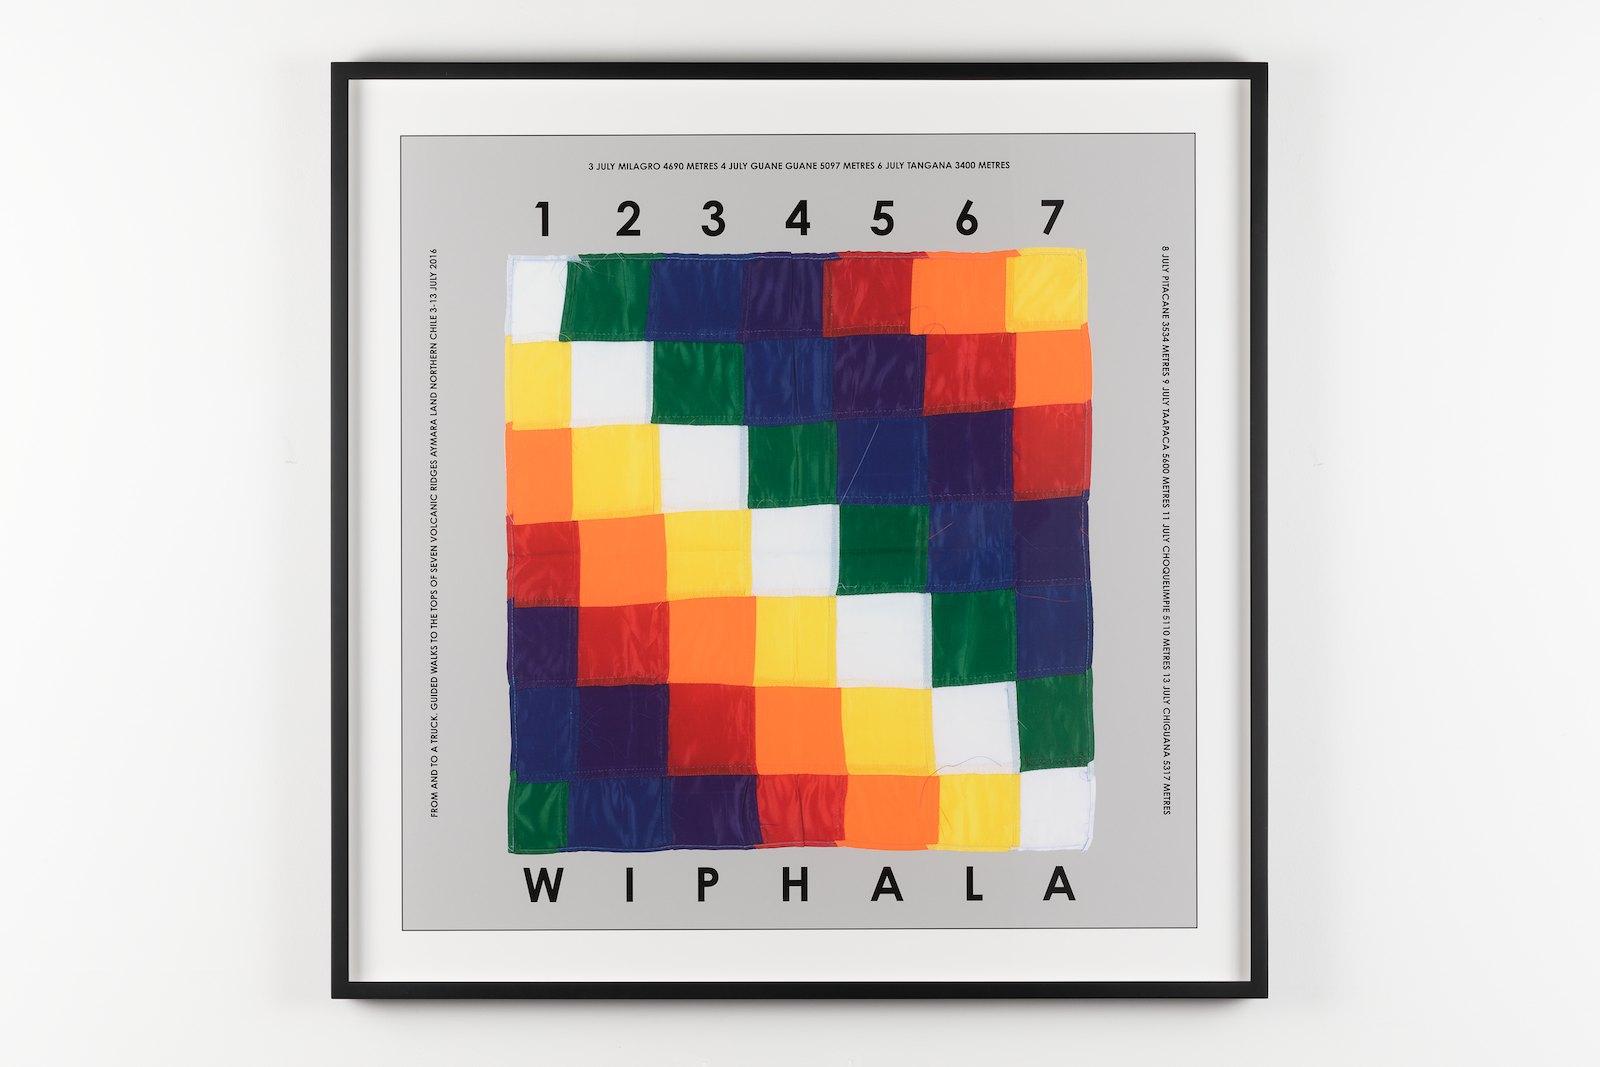 Whiphala, Chile 2016. Archival inkjet print, 79,5 x 79,5 cm. Ed. 3/50